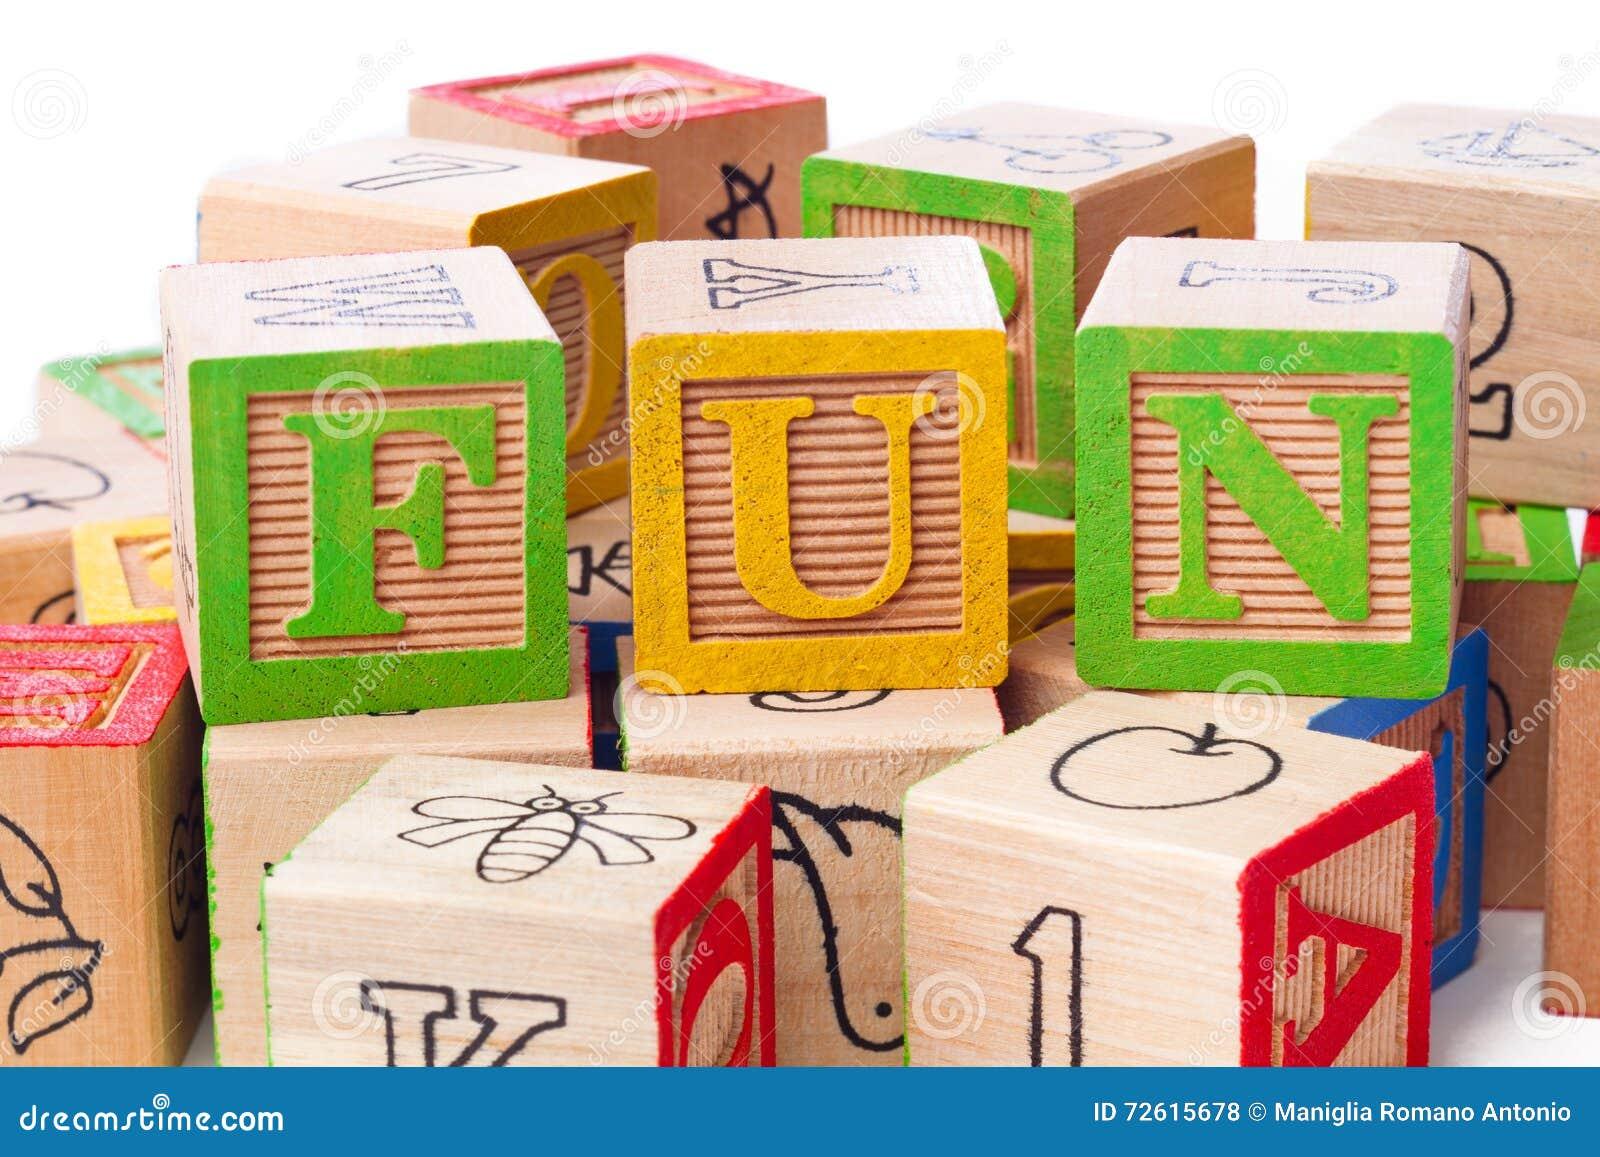 Three building blocks forming a word fun